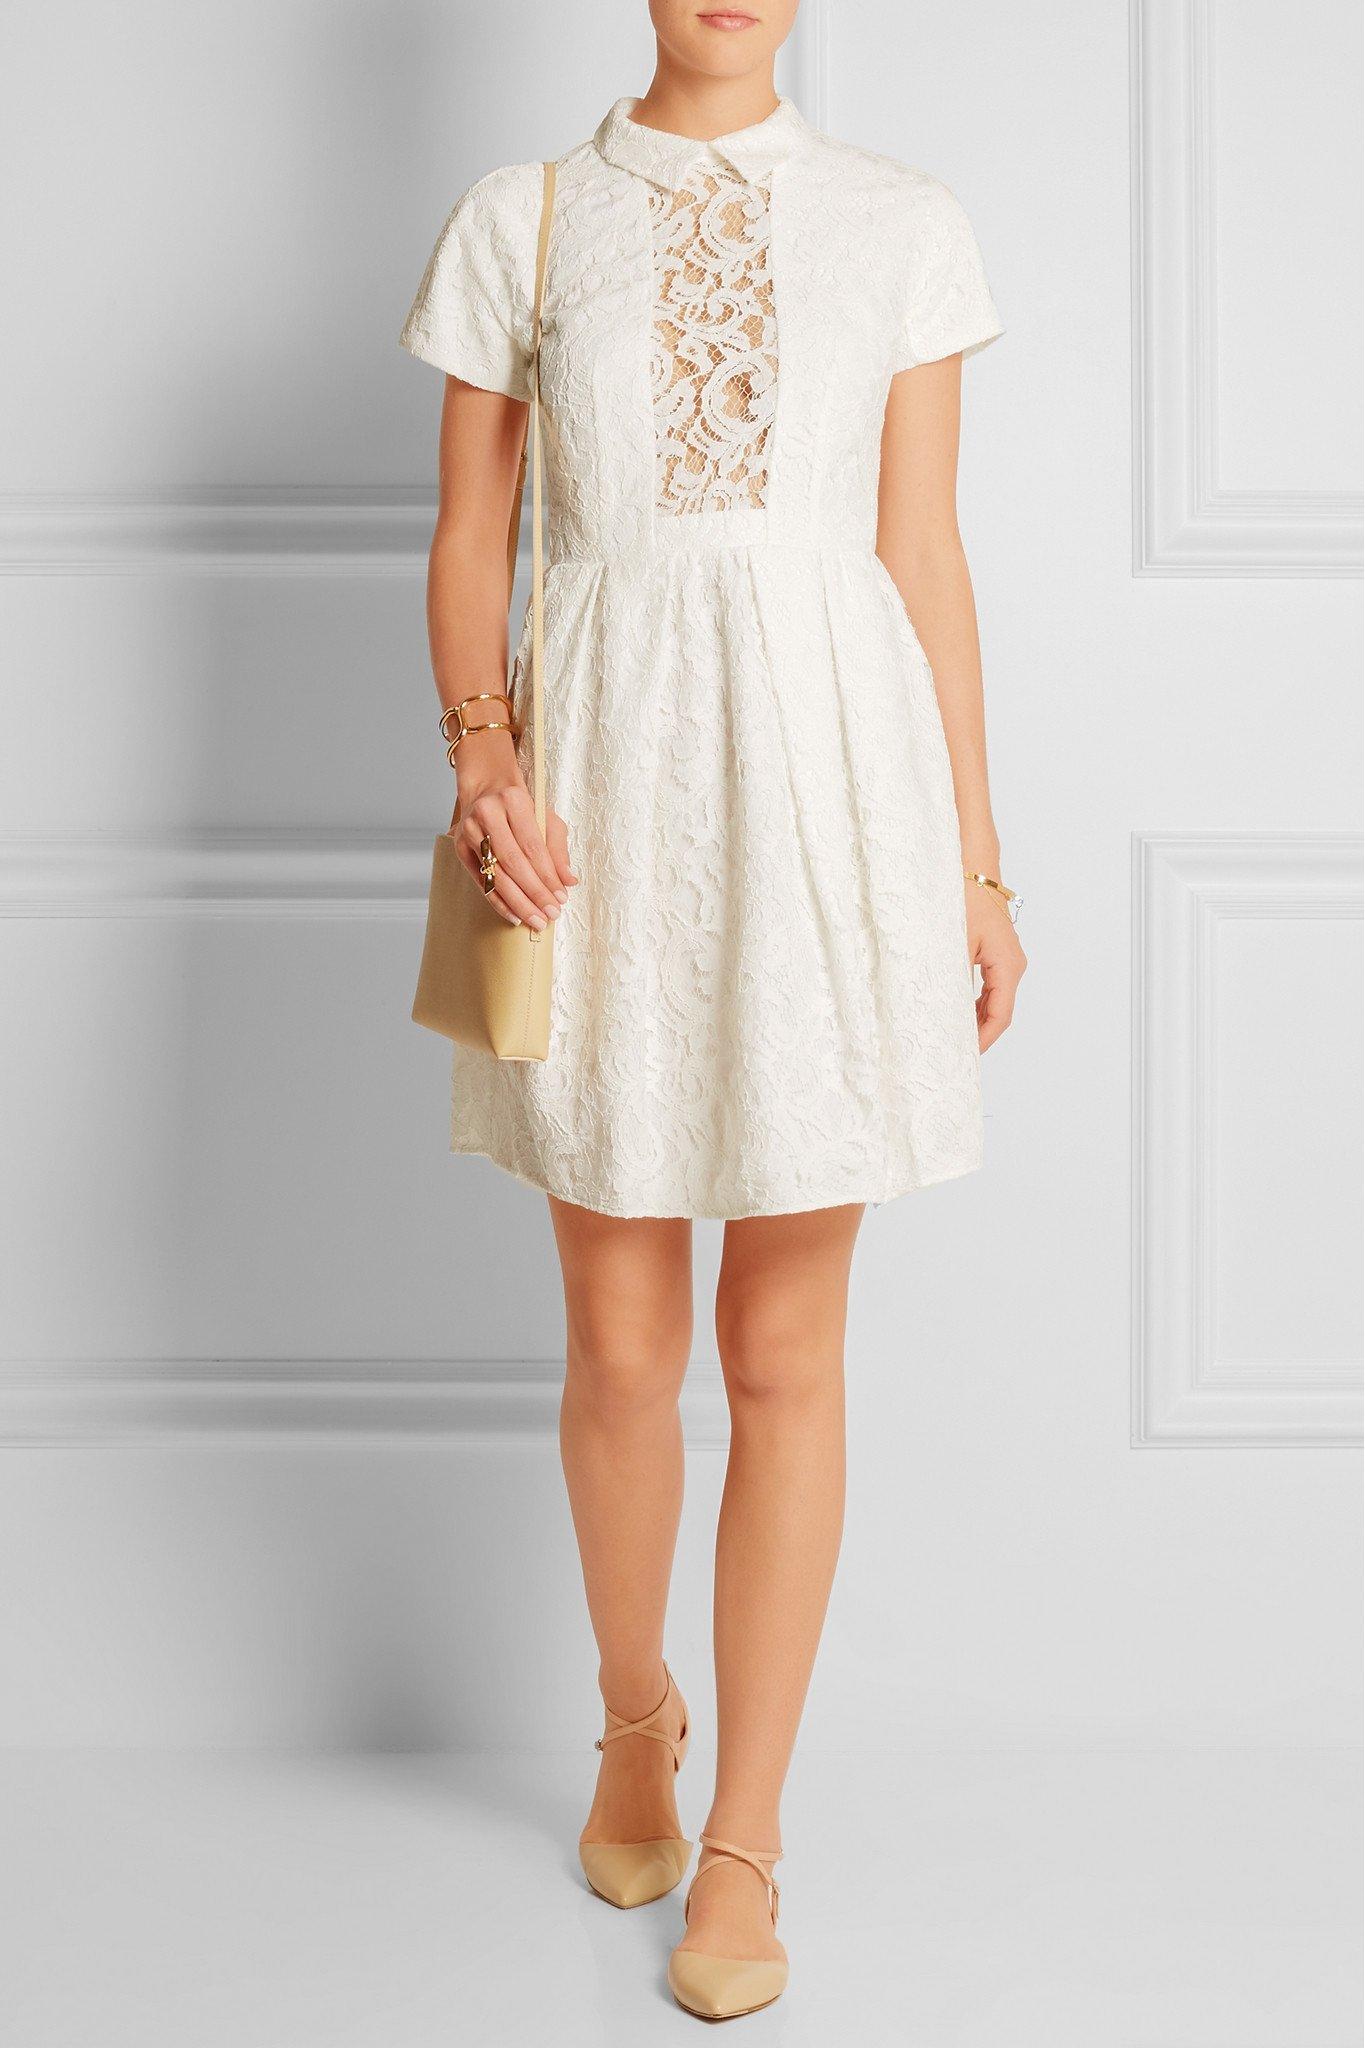 Lyst - Carven Cutout Guipure Lace Mini Dress in White